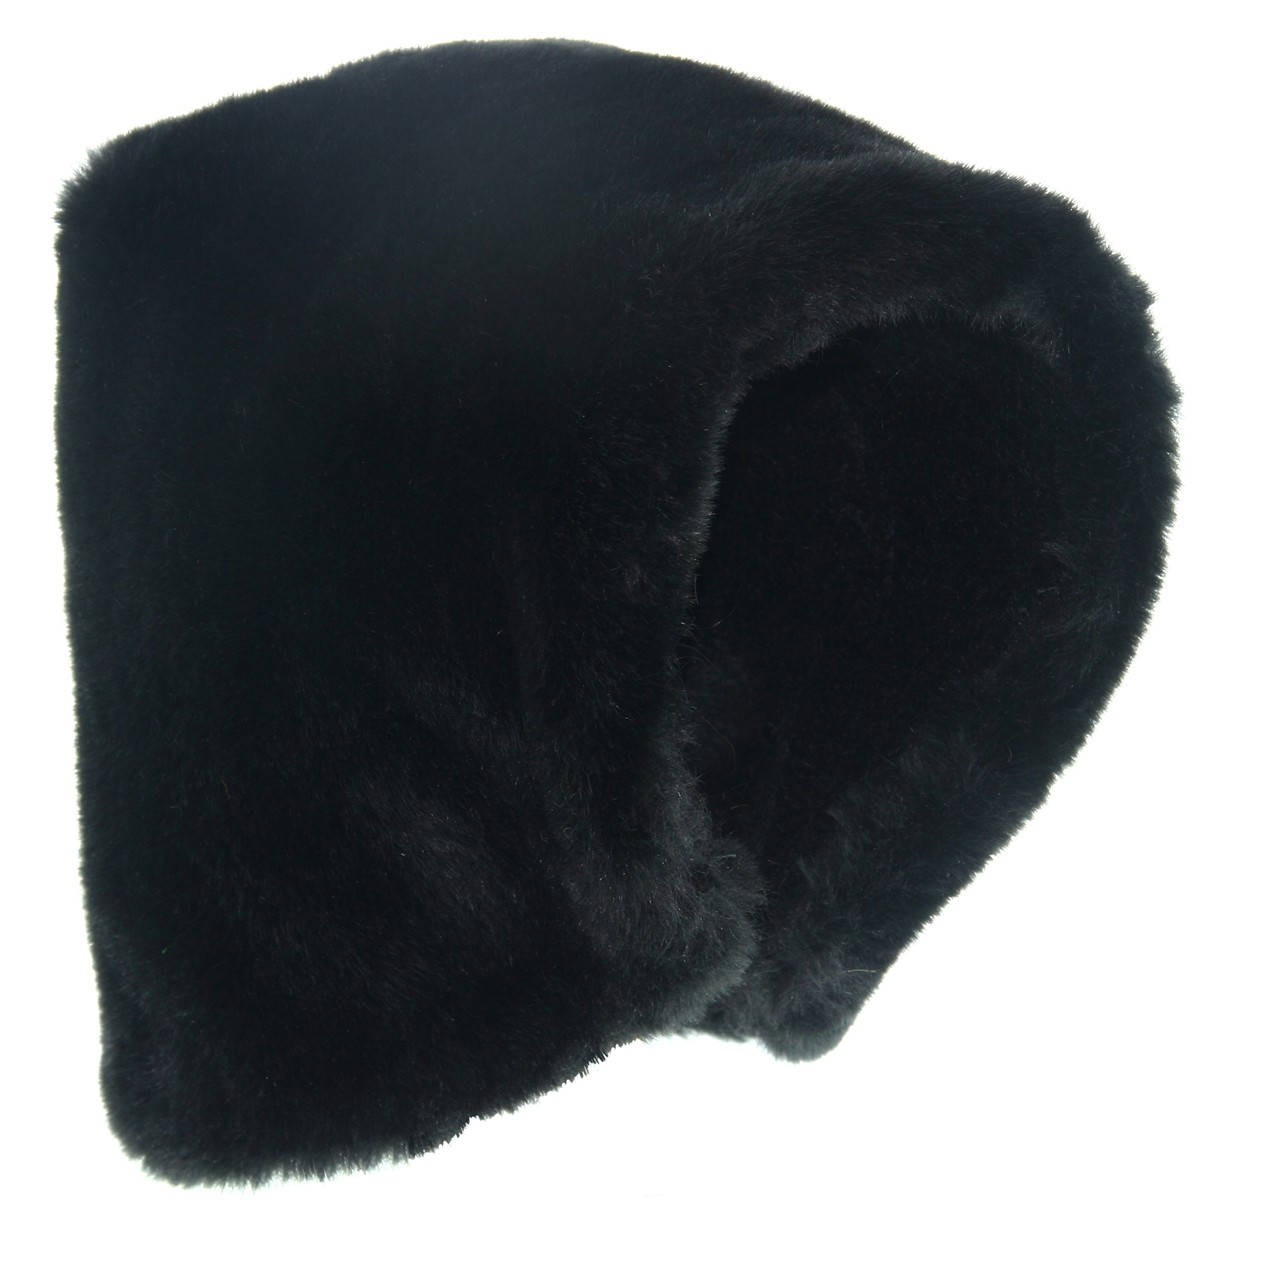 Faux Fur Cuddle Cap for Warm Winter 0fed7e6b813